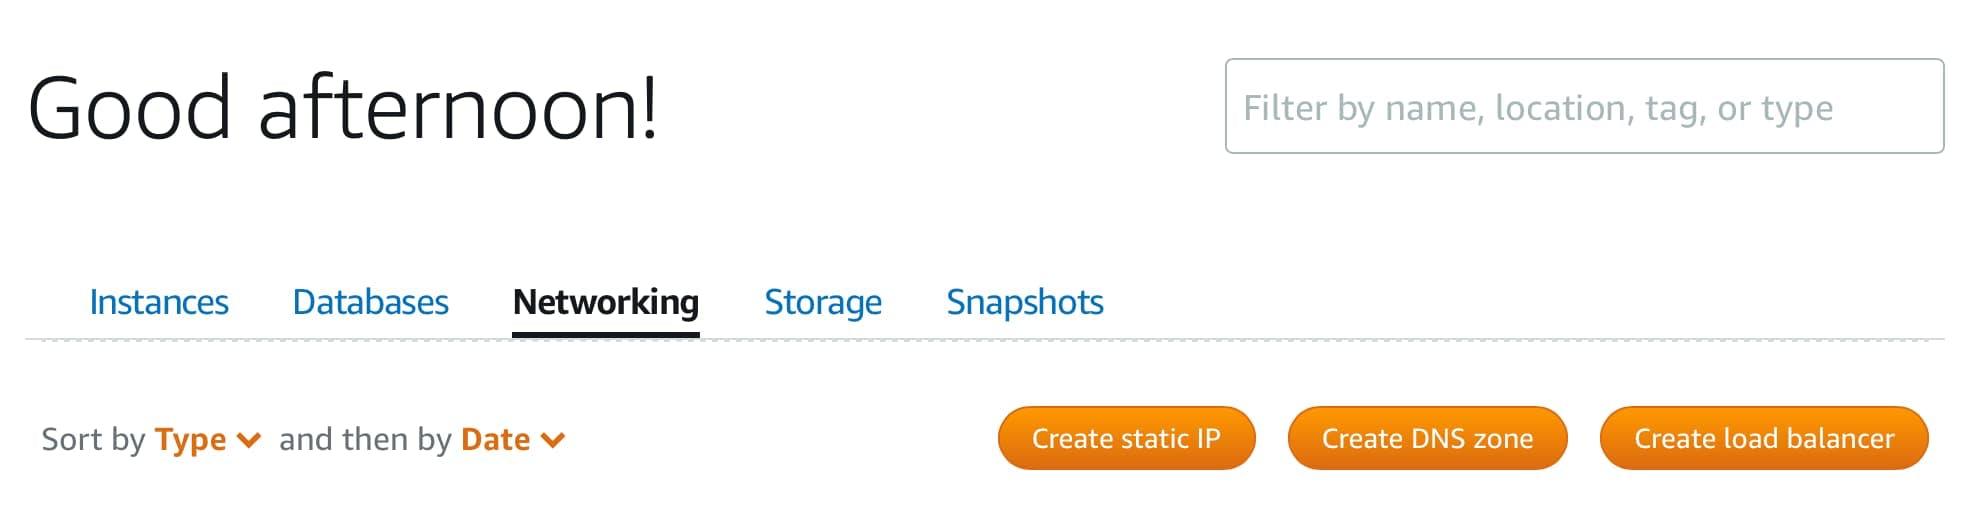 Amazon Lightsail create static IP